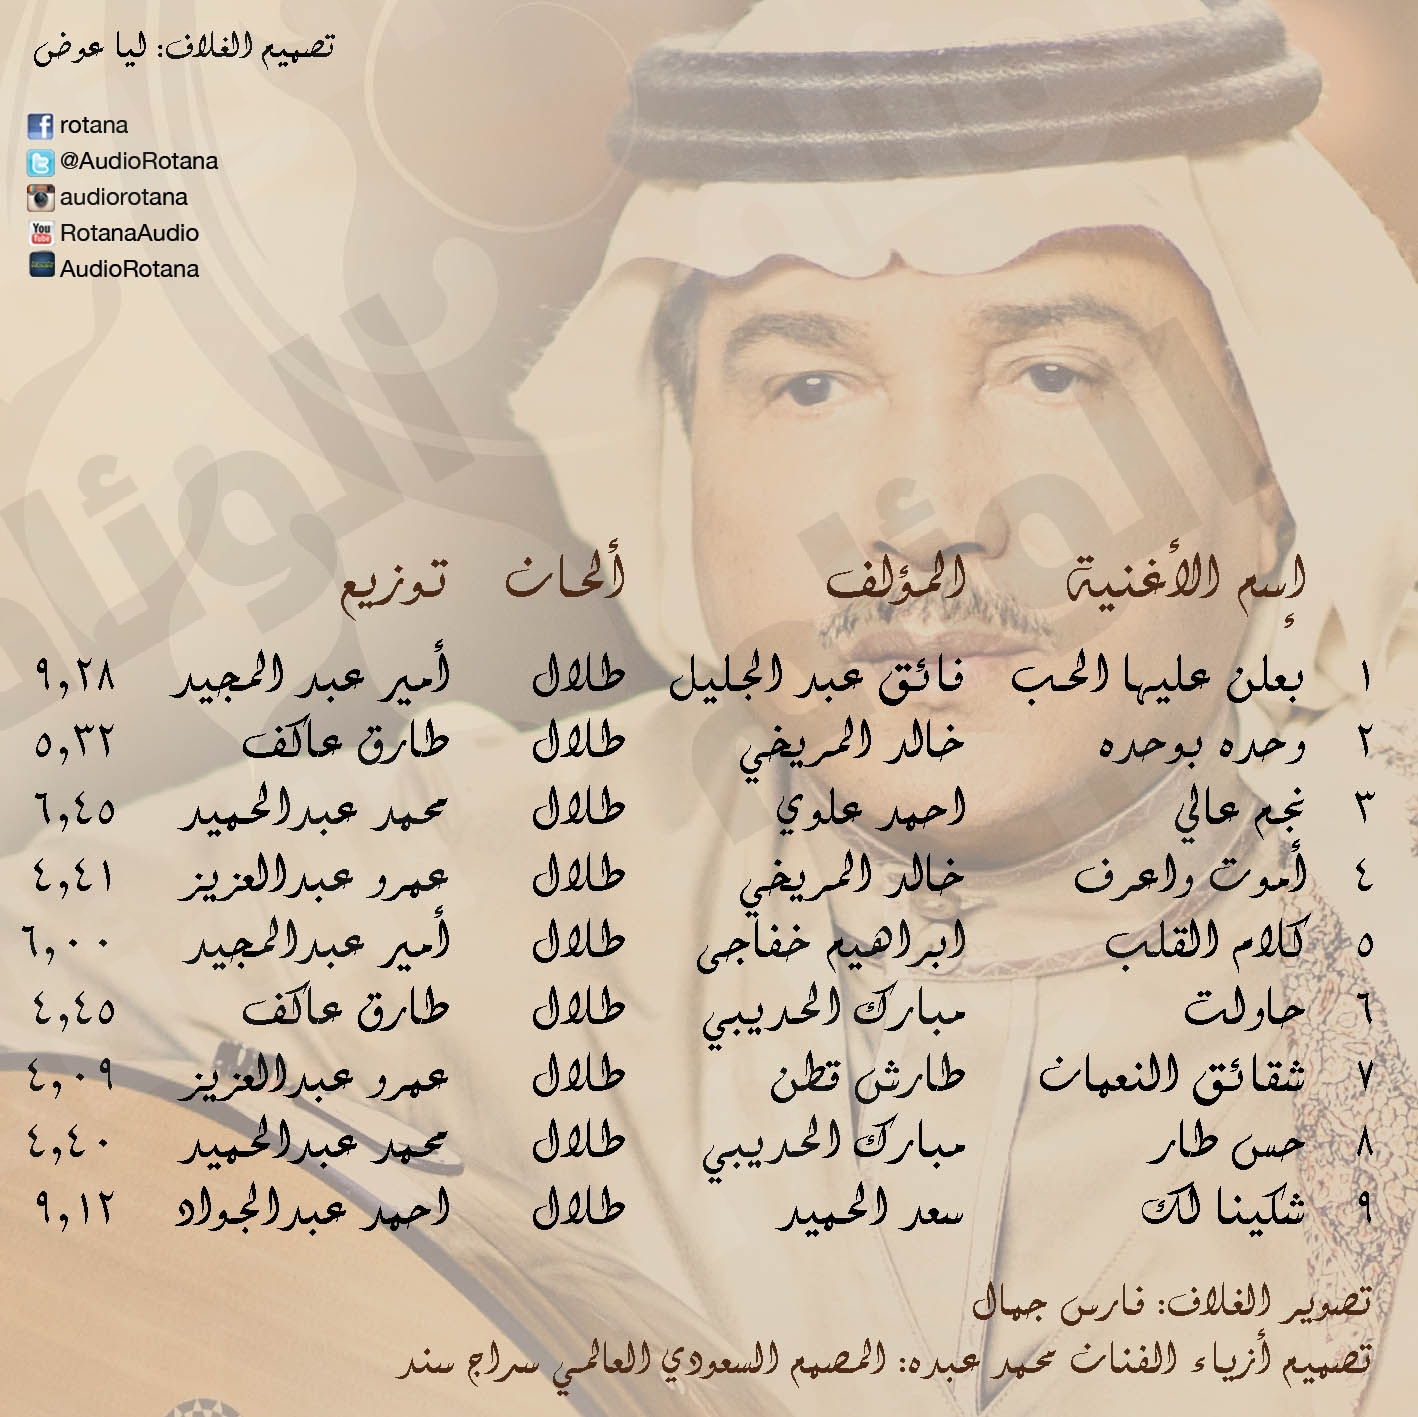 Mohamad Abdo- Ba'alen 'Aaleiha el Hob- Details